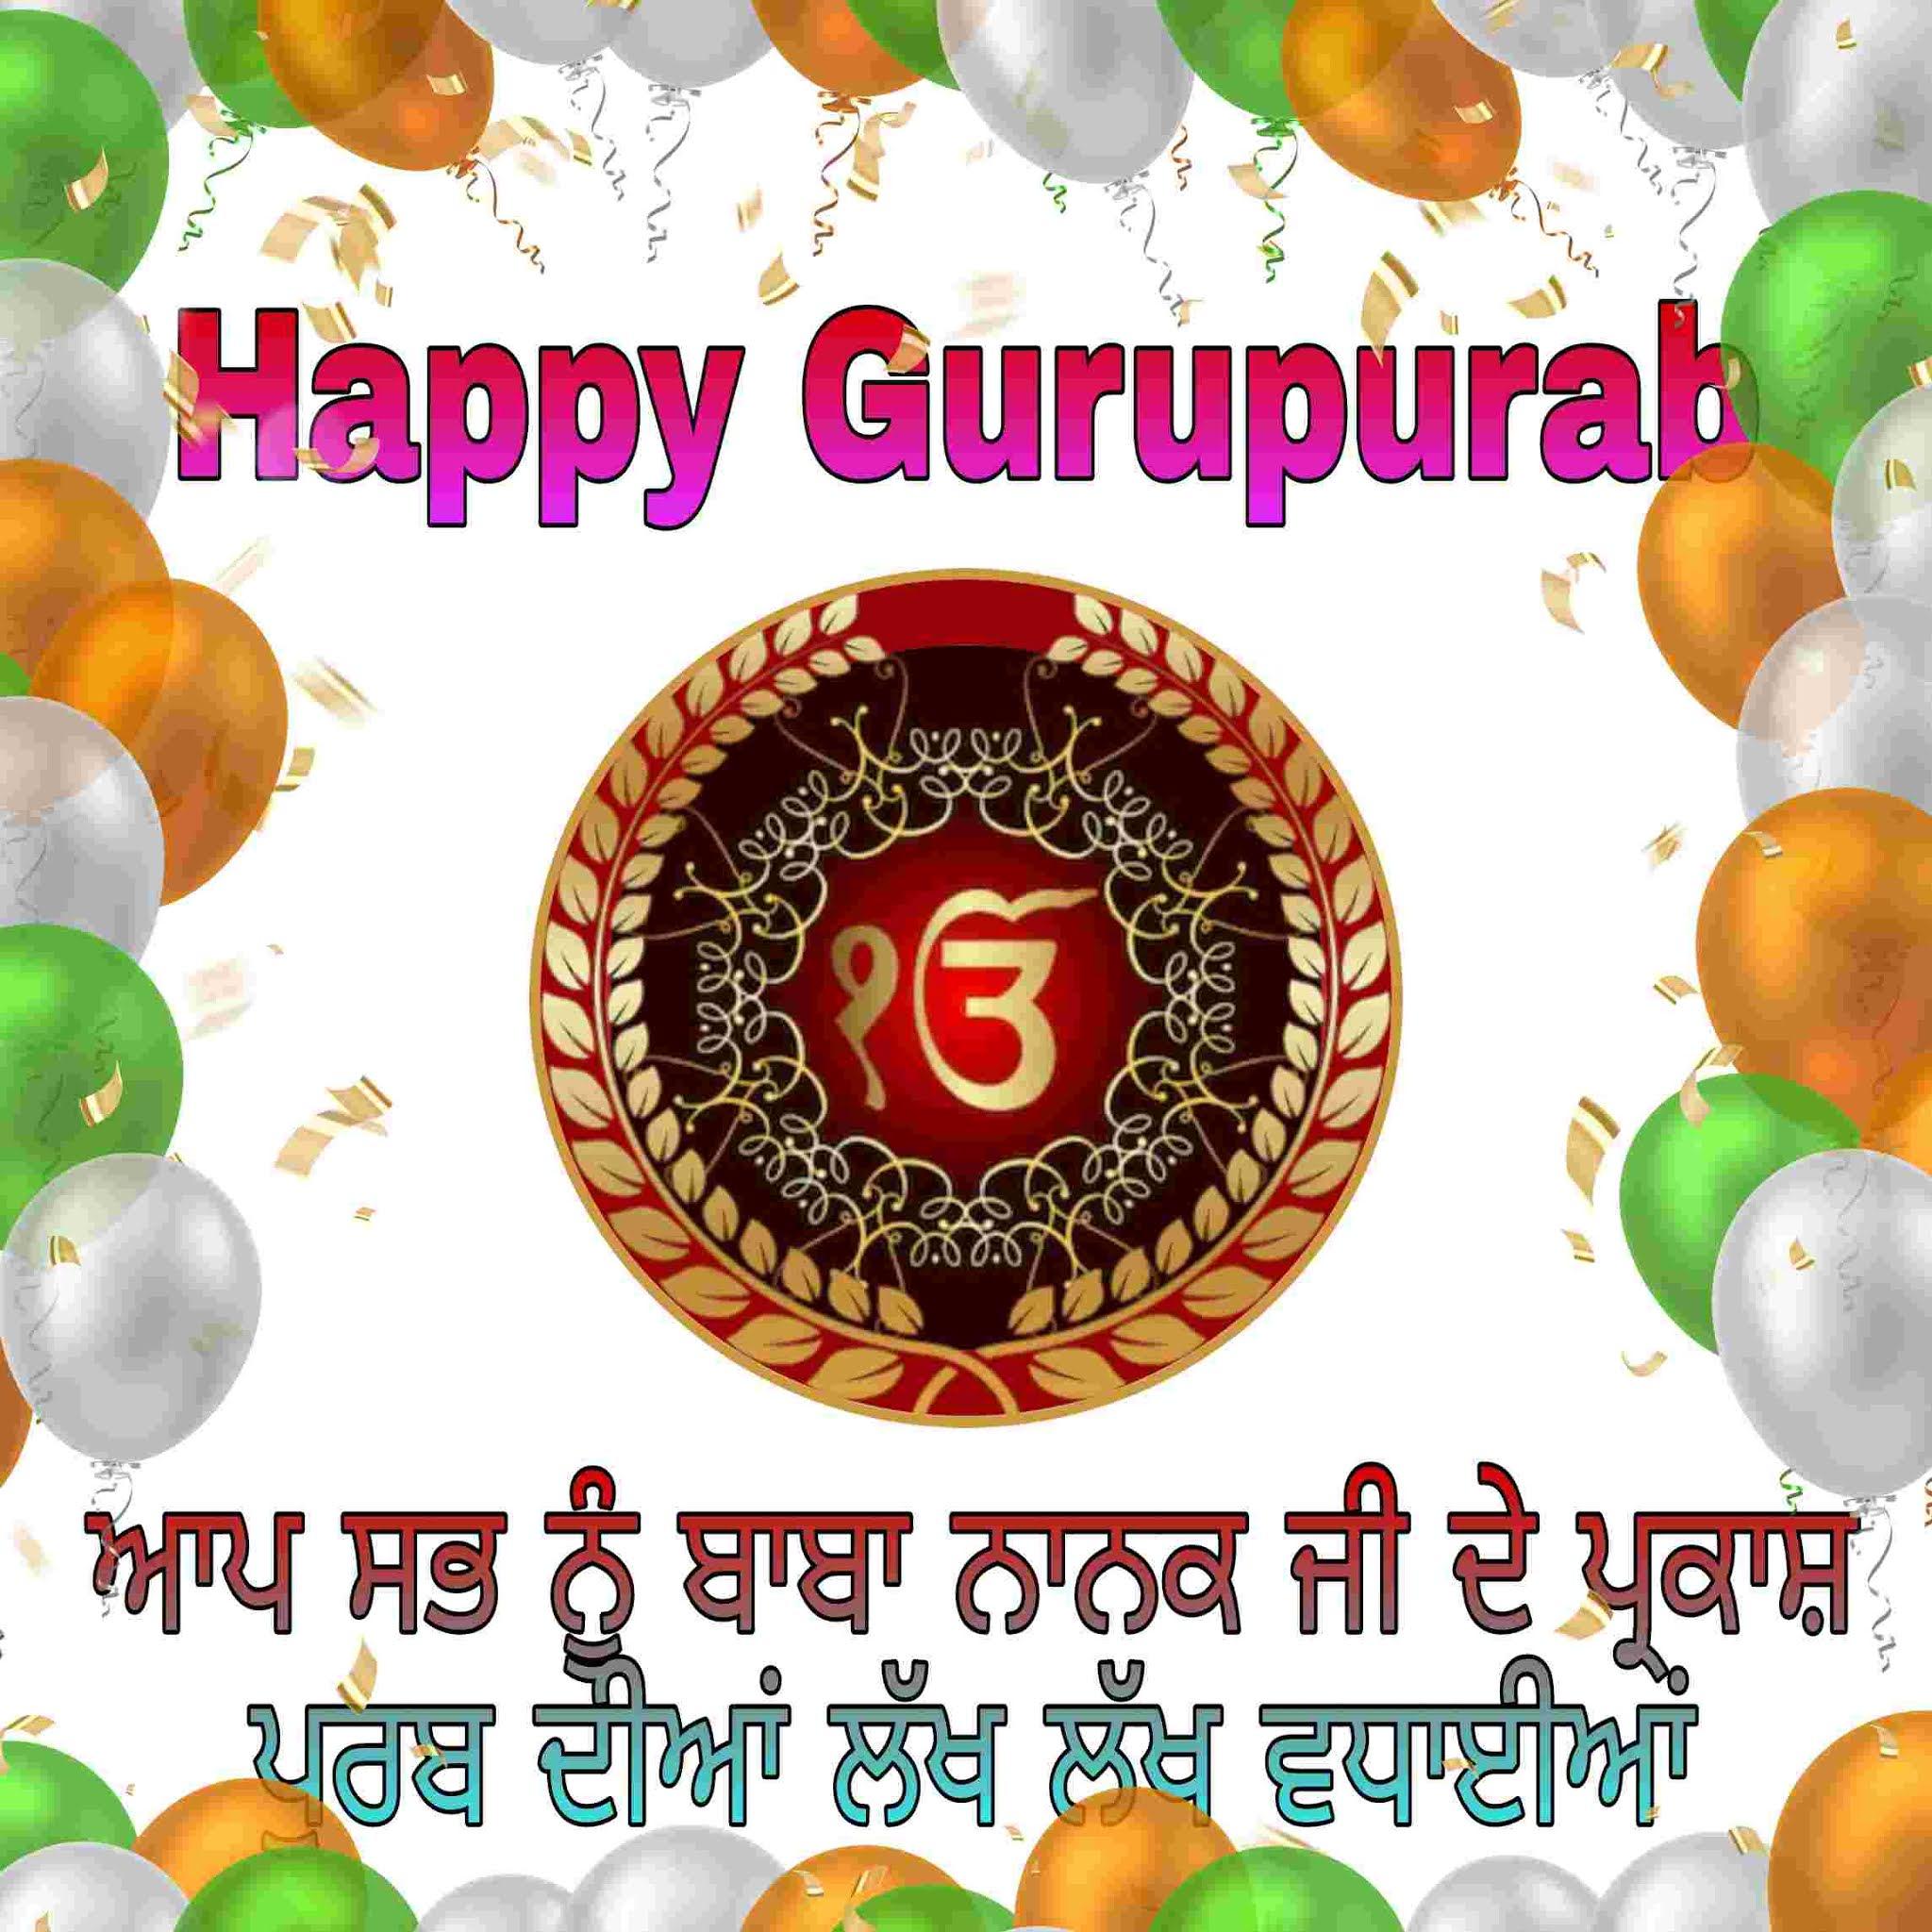 happy gurupurab wishes in punjabi, happy gurupurab 2020 punjabi,